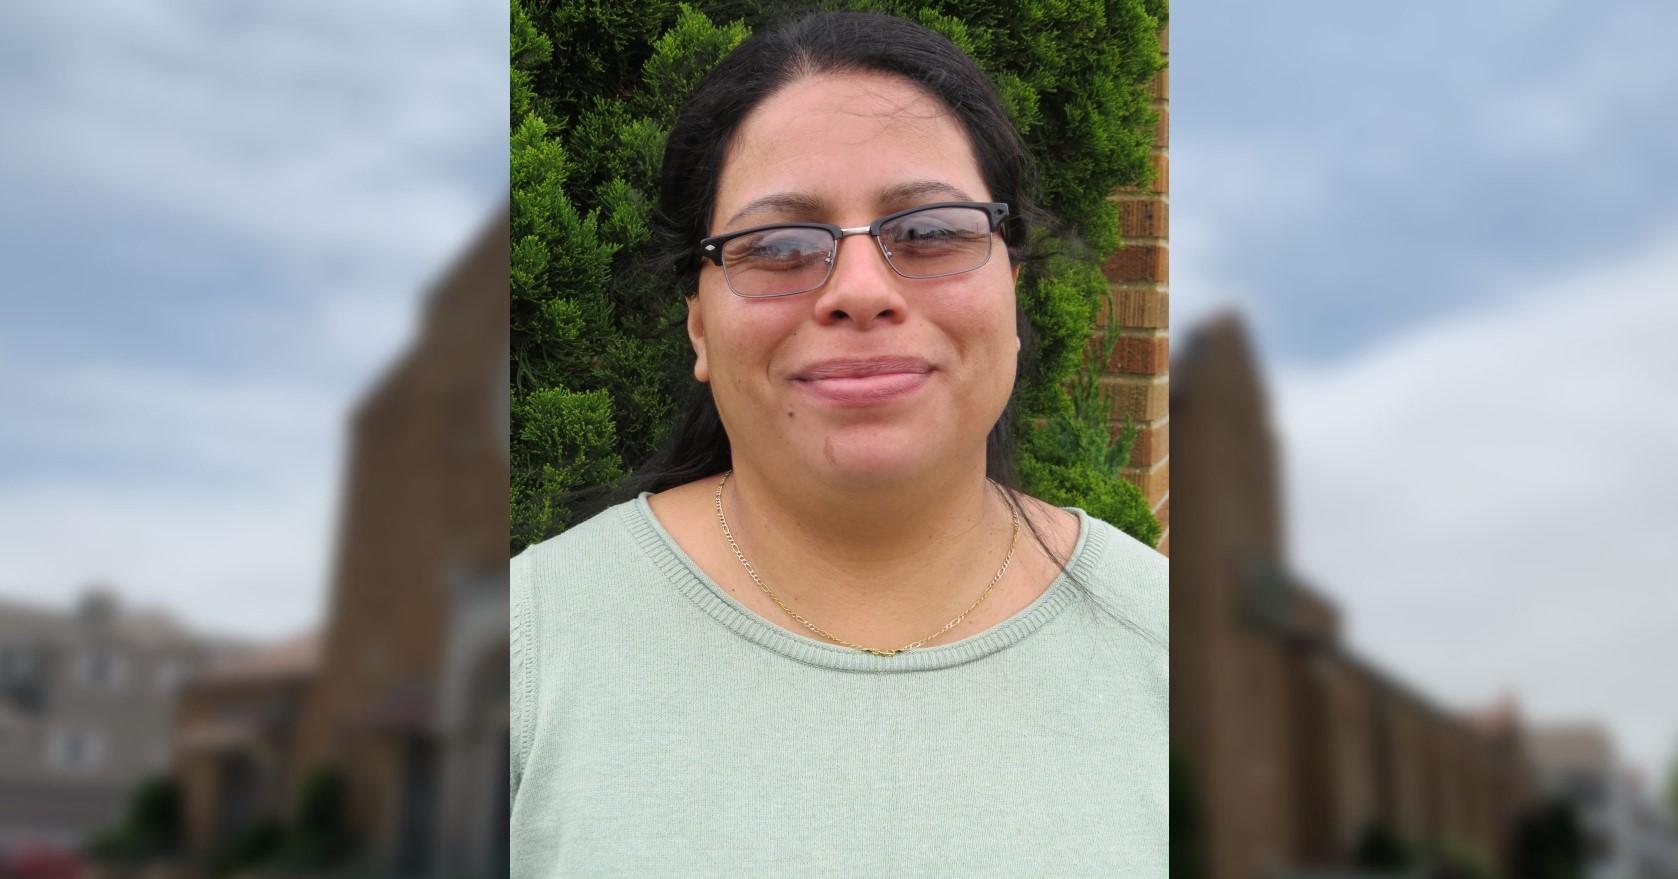 Know Your Fellow Parishioner: Rosalia Gil